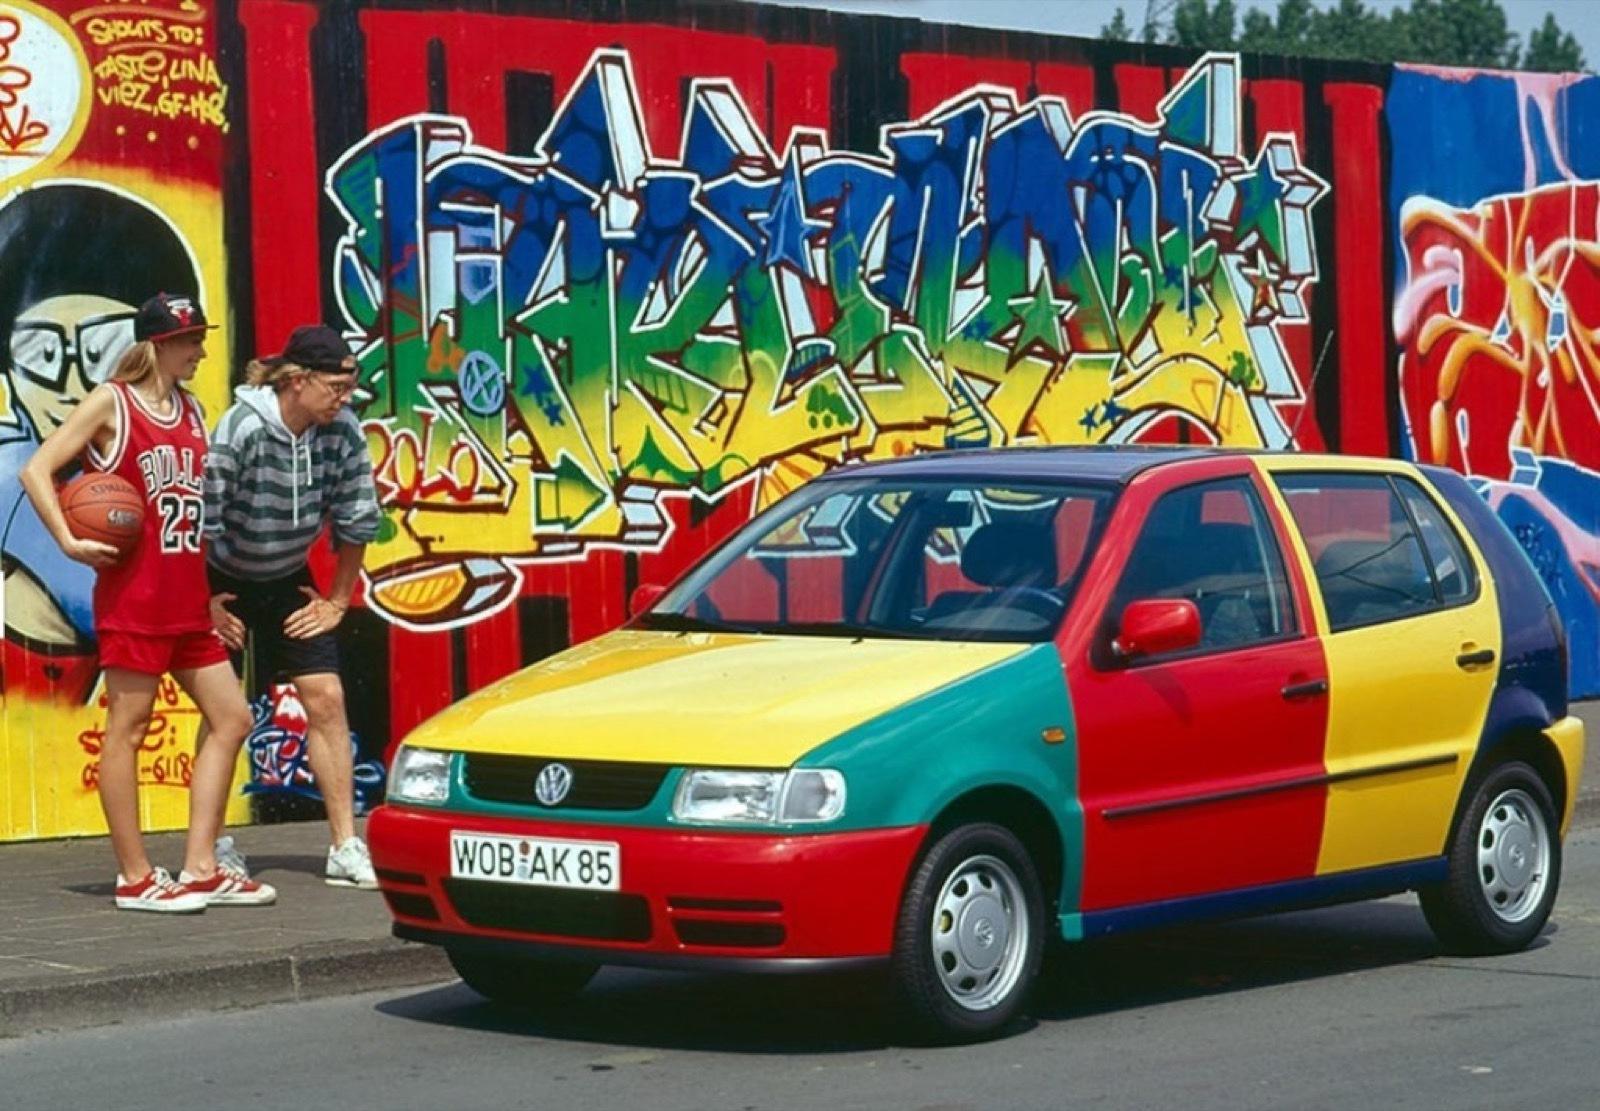 Volkswagen_Netherlands_modern_Polo_Harlekin_0010